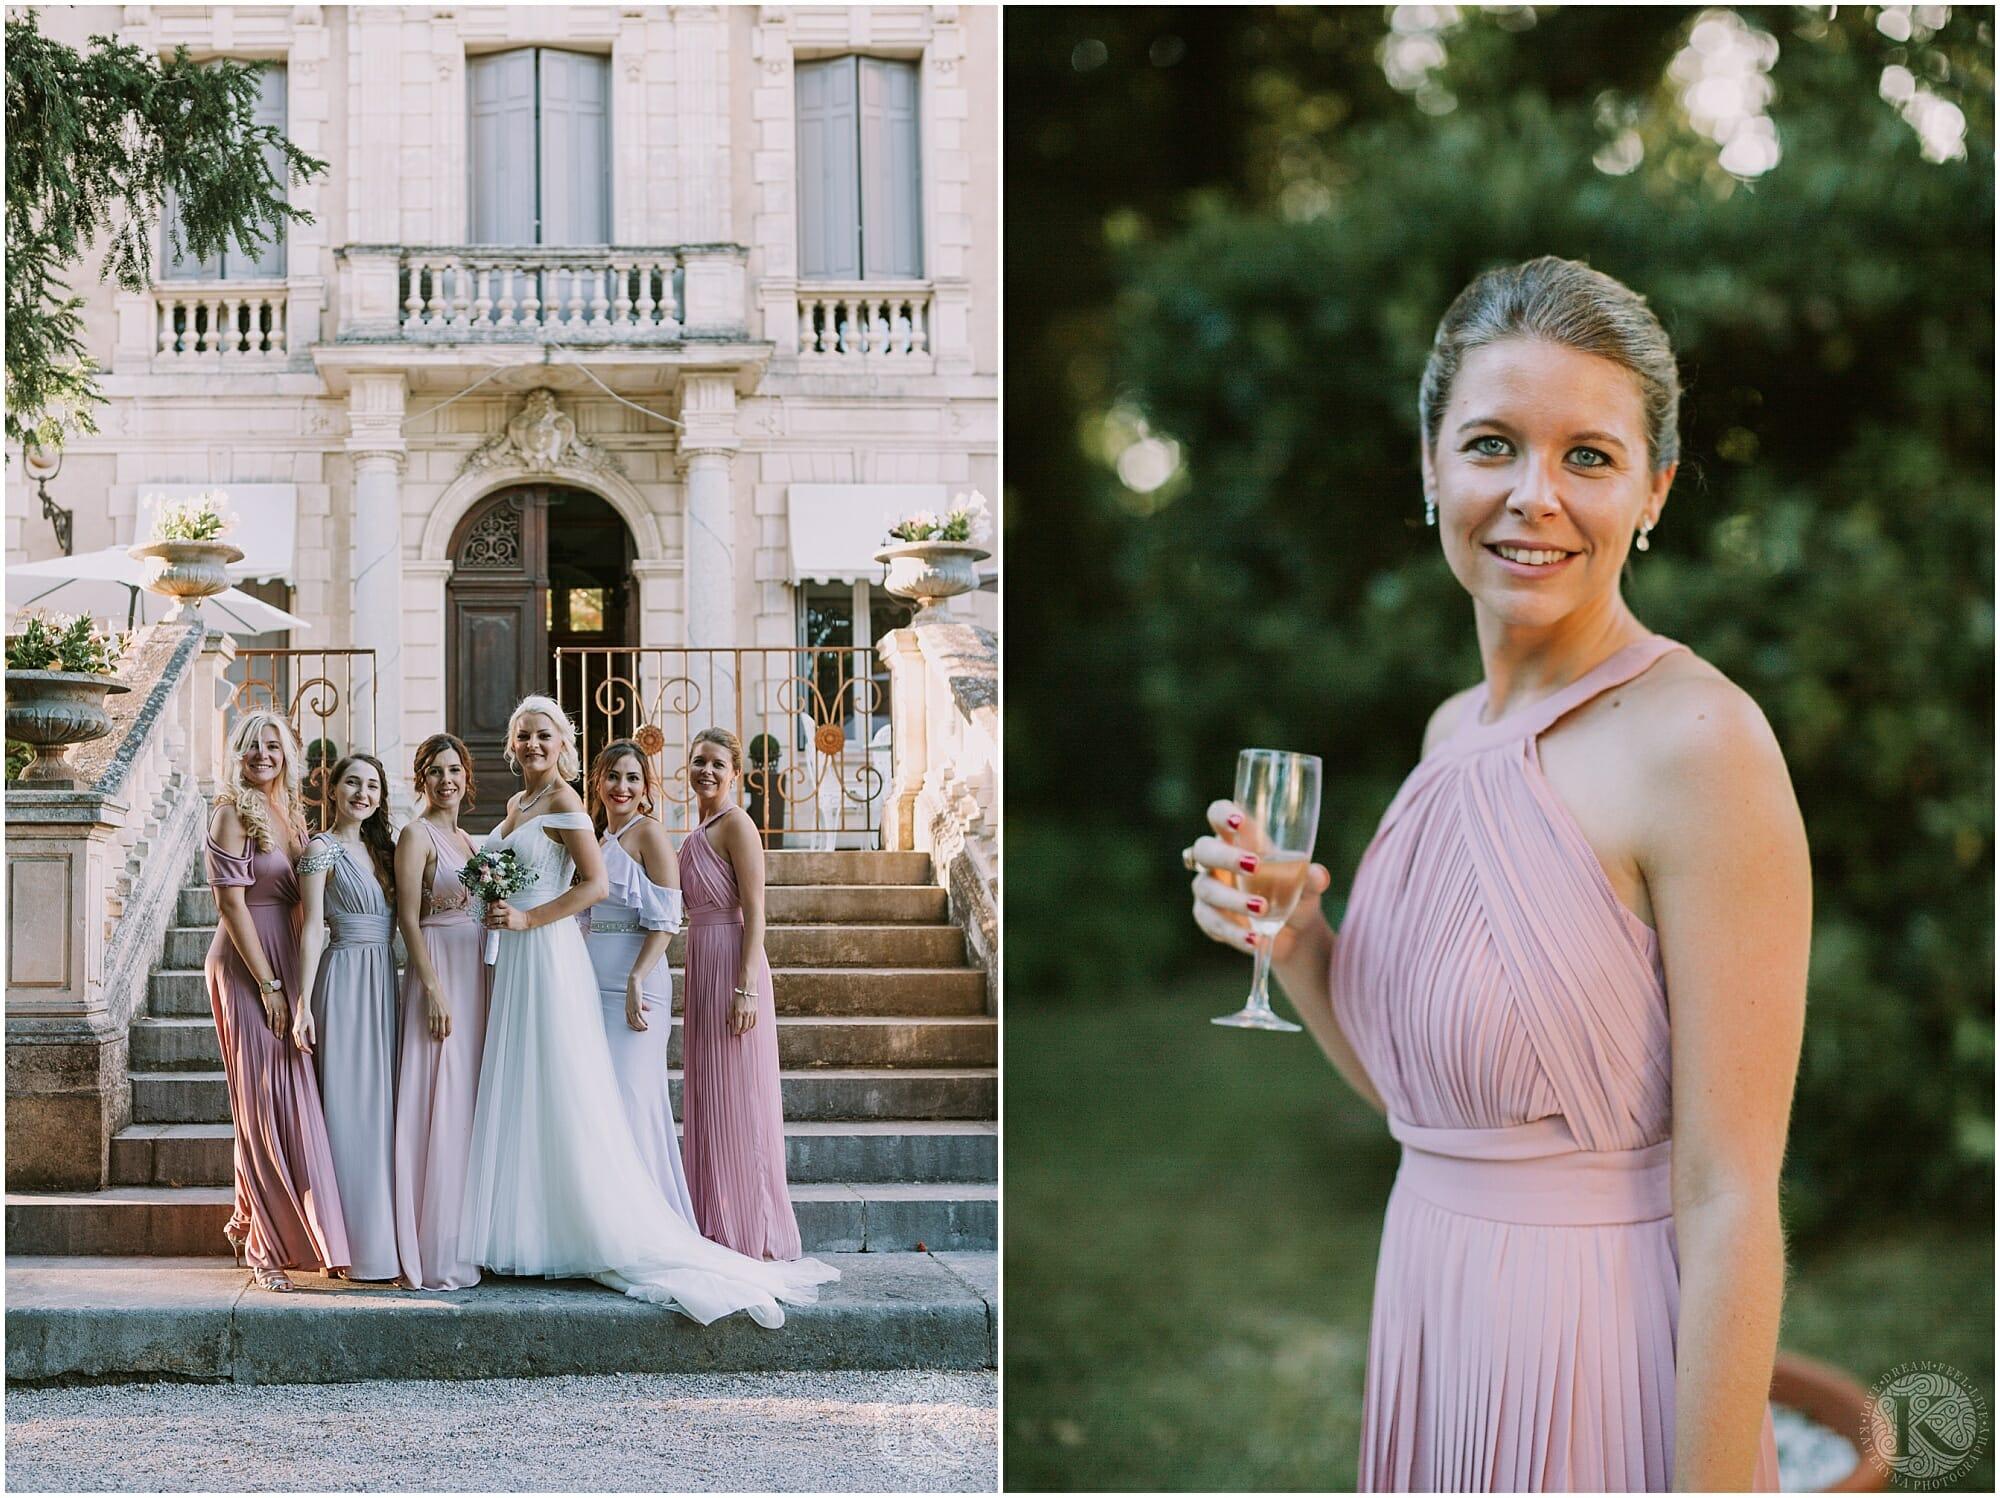 Kateryna-photos-photographe-mariage-chateau-des-3-fontaines-provence-avignon-vaucluse-sud_0073.jpg